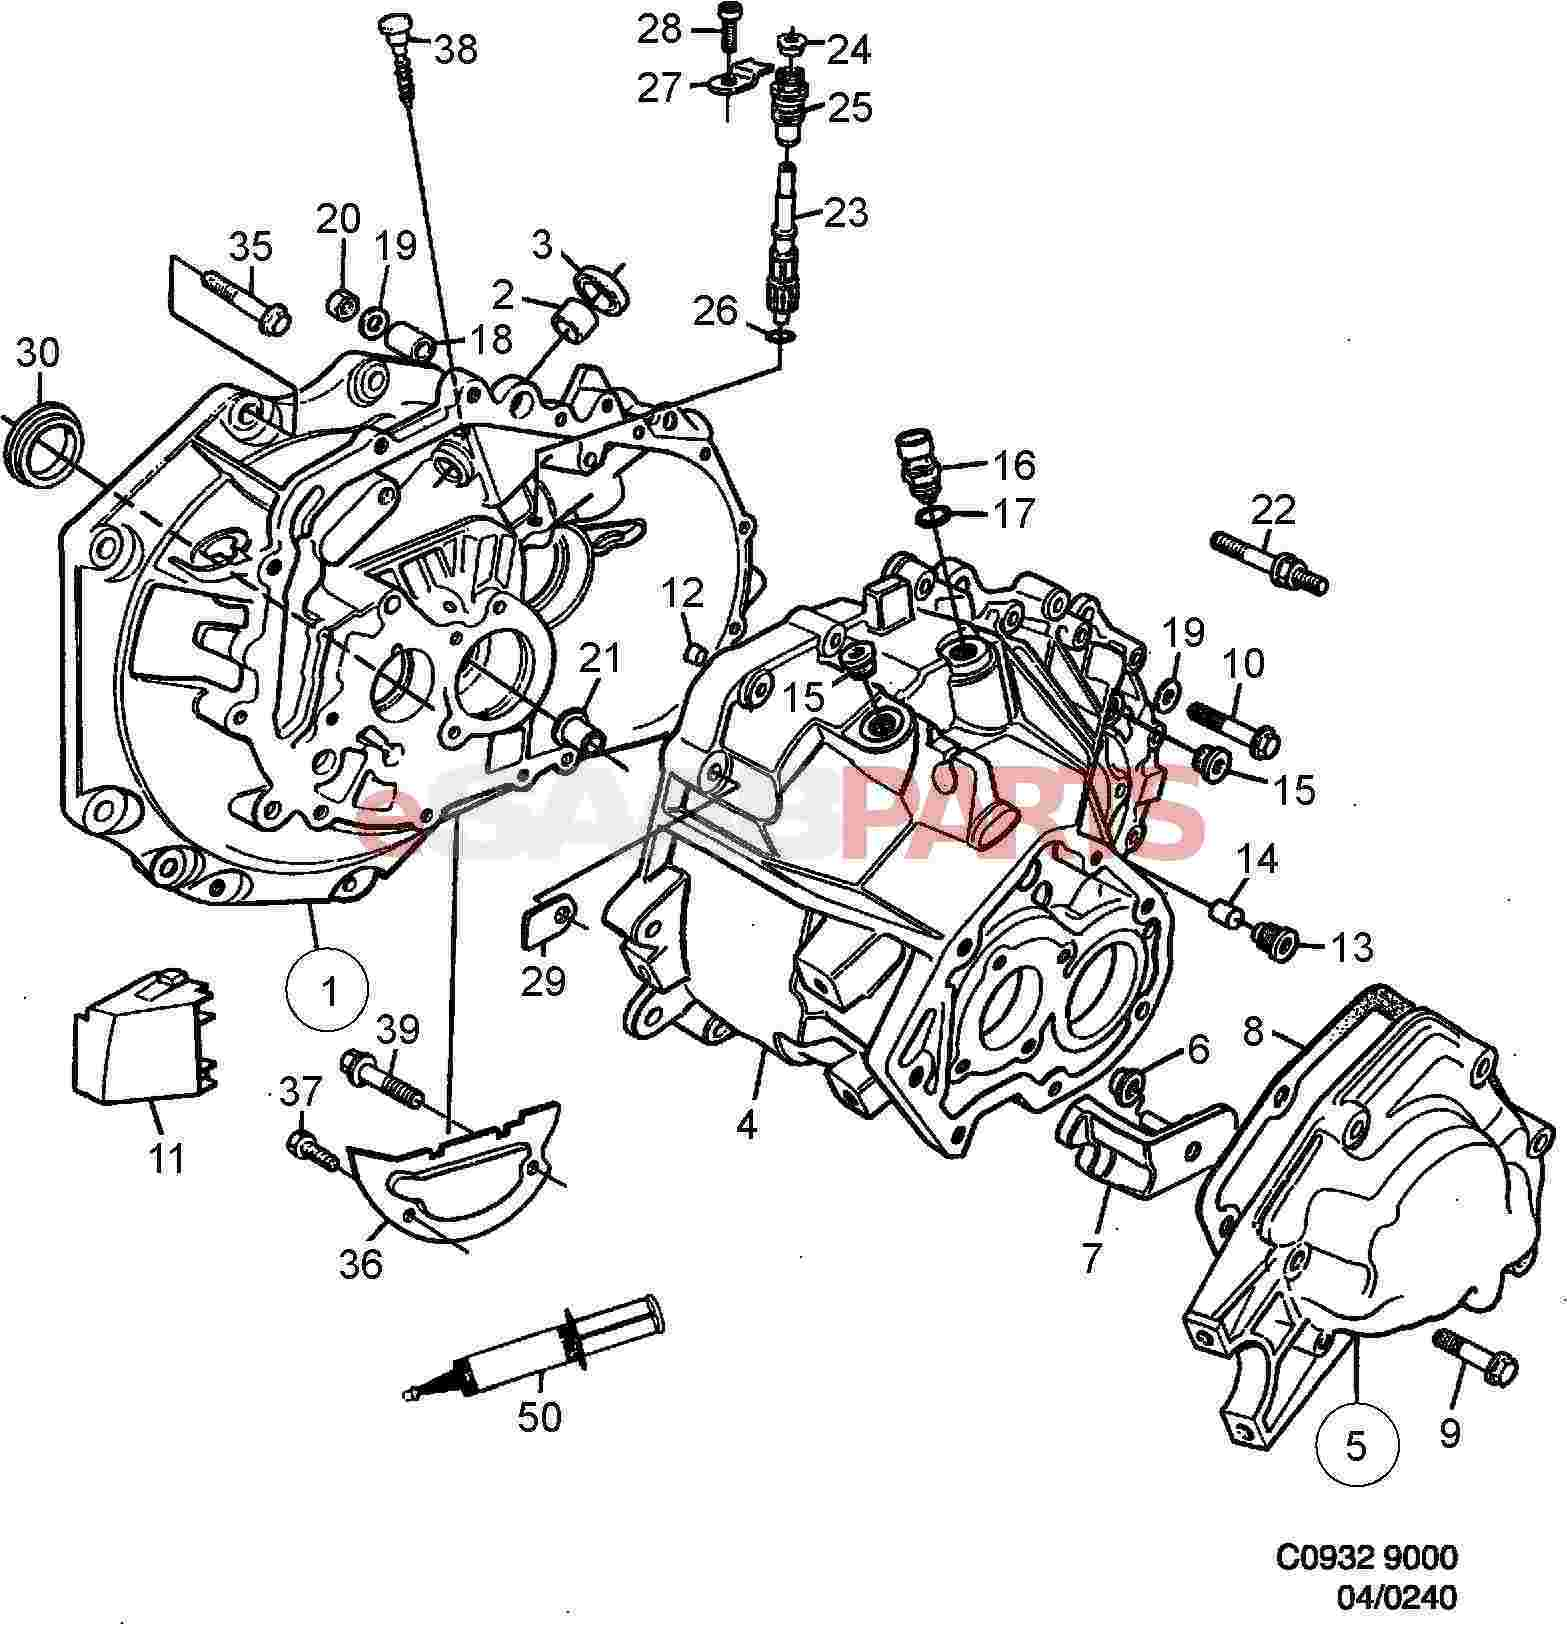 2008 saab 9 3 wiring diagram vauxhall vectra c manual transmission html